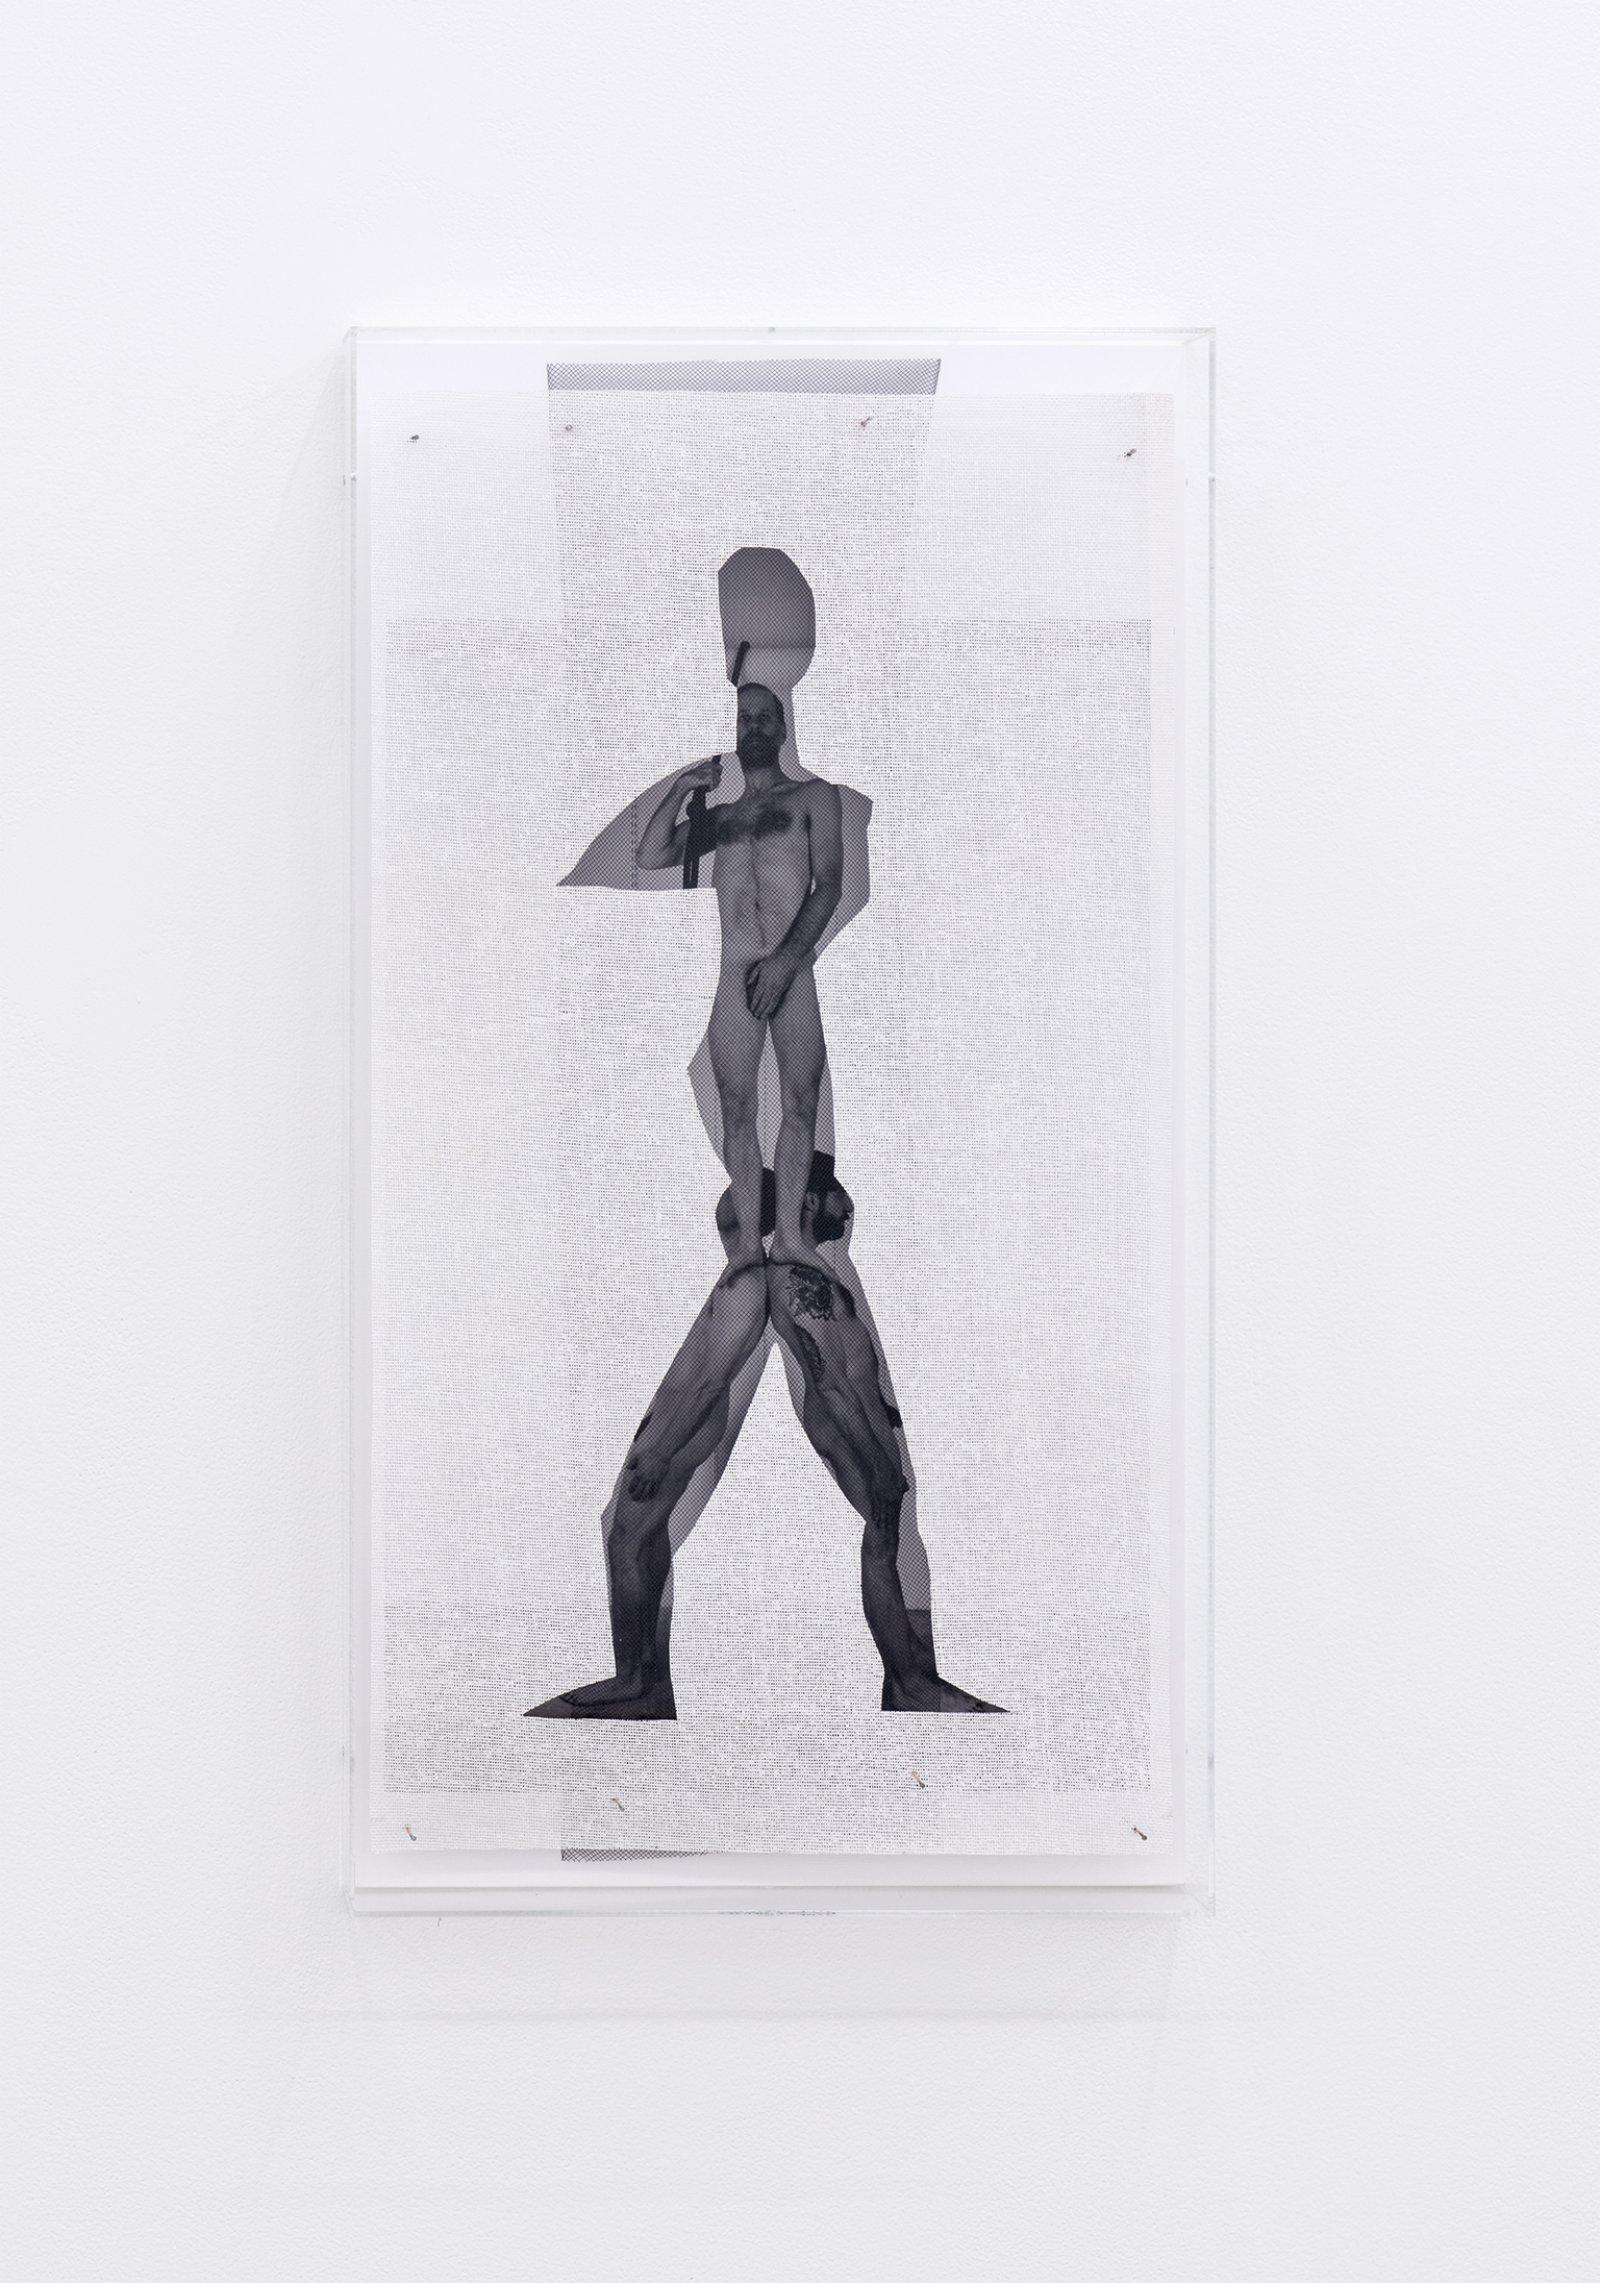 Valérie Blass, Je ne choisis pas (I don't choose), 2015, inkjet print, tulle, heavy buckram, plexiglass, 26 x 14 x 3 in. (66 x 34 x 6 cm)  by Valérie Blass